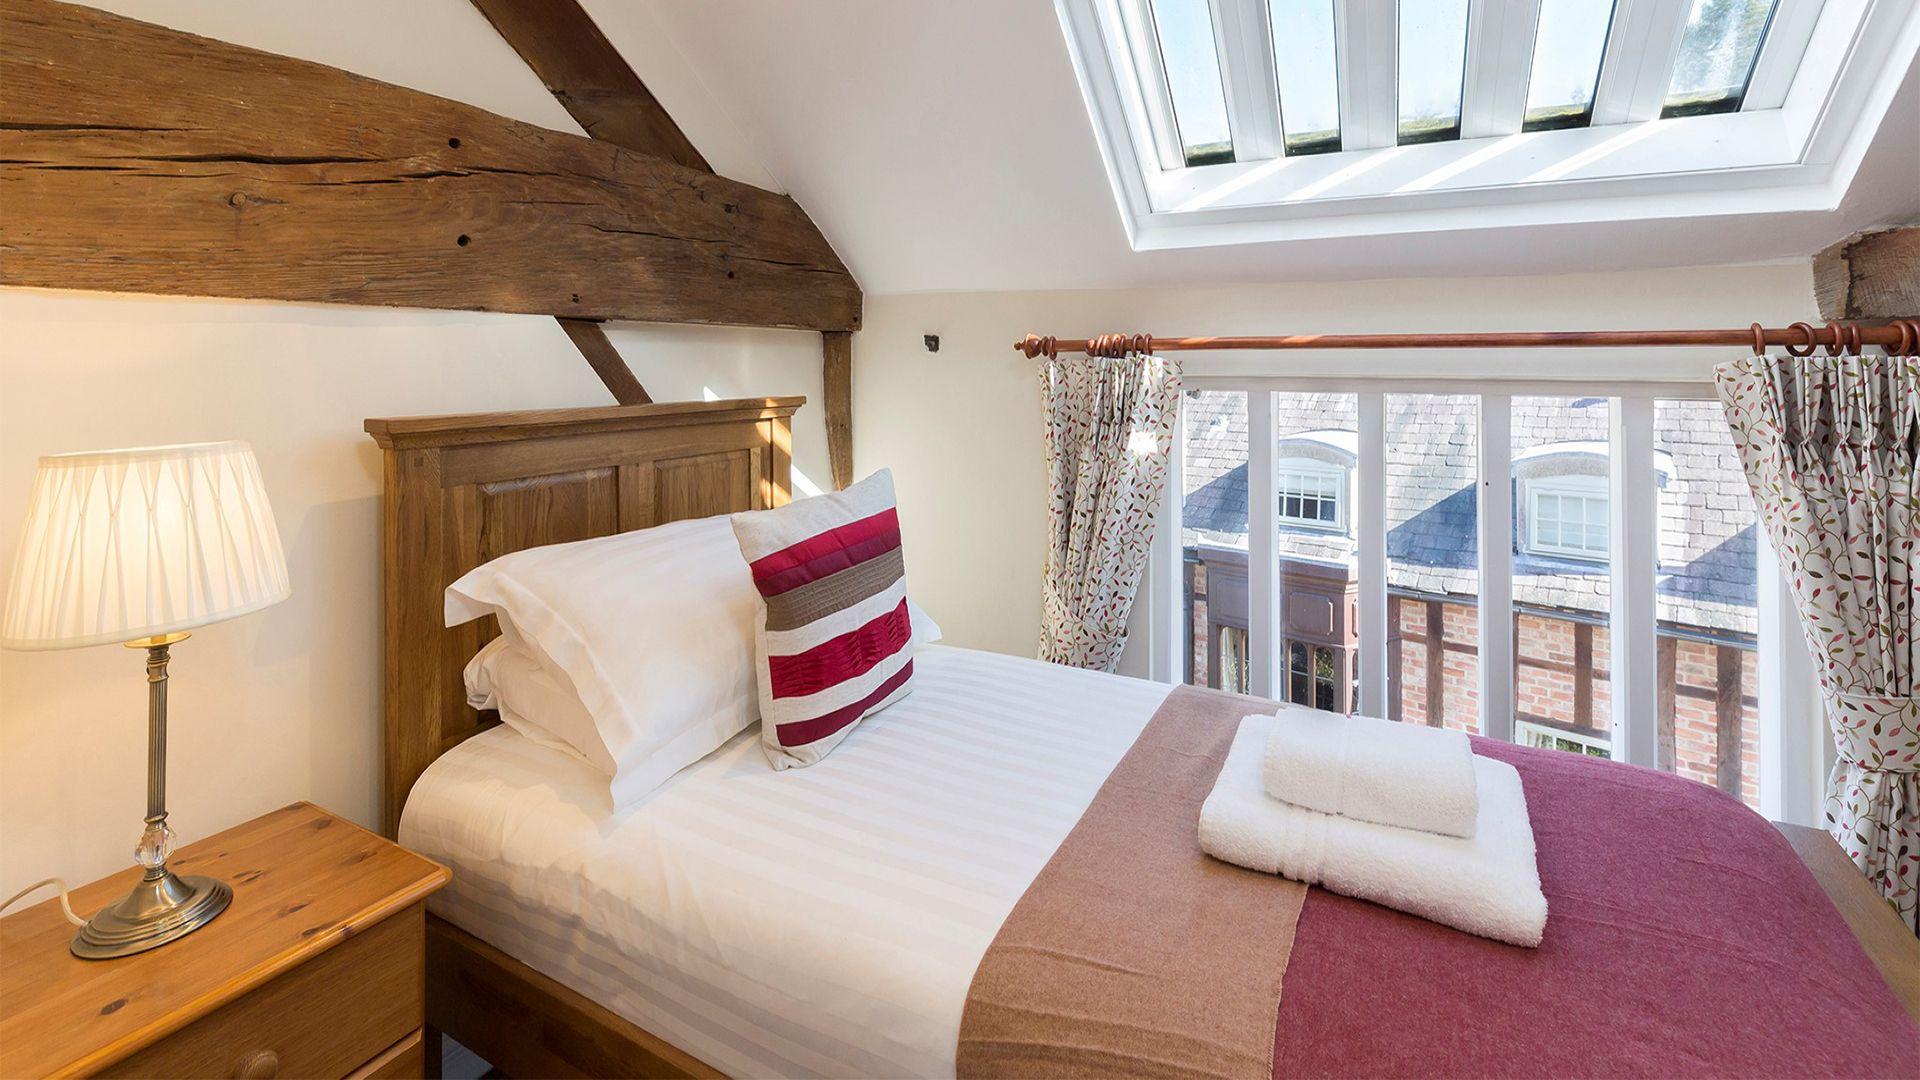 Single bedroom, St Kenelm at Sudeley Castle, Bolthole Retreats